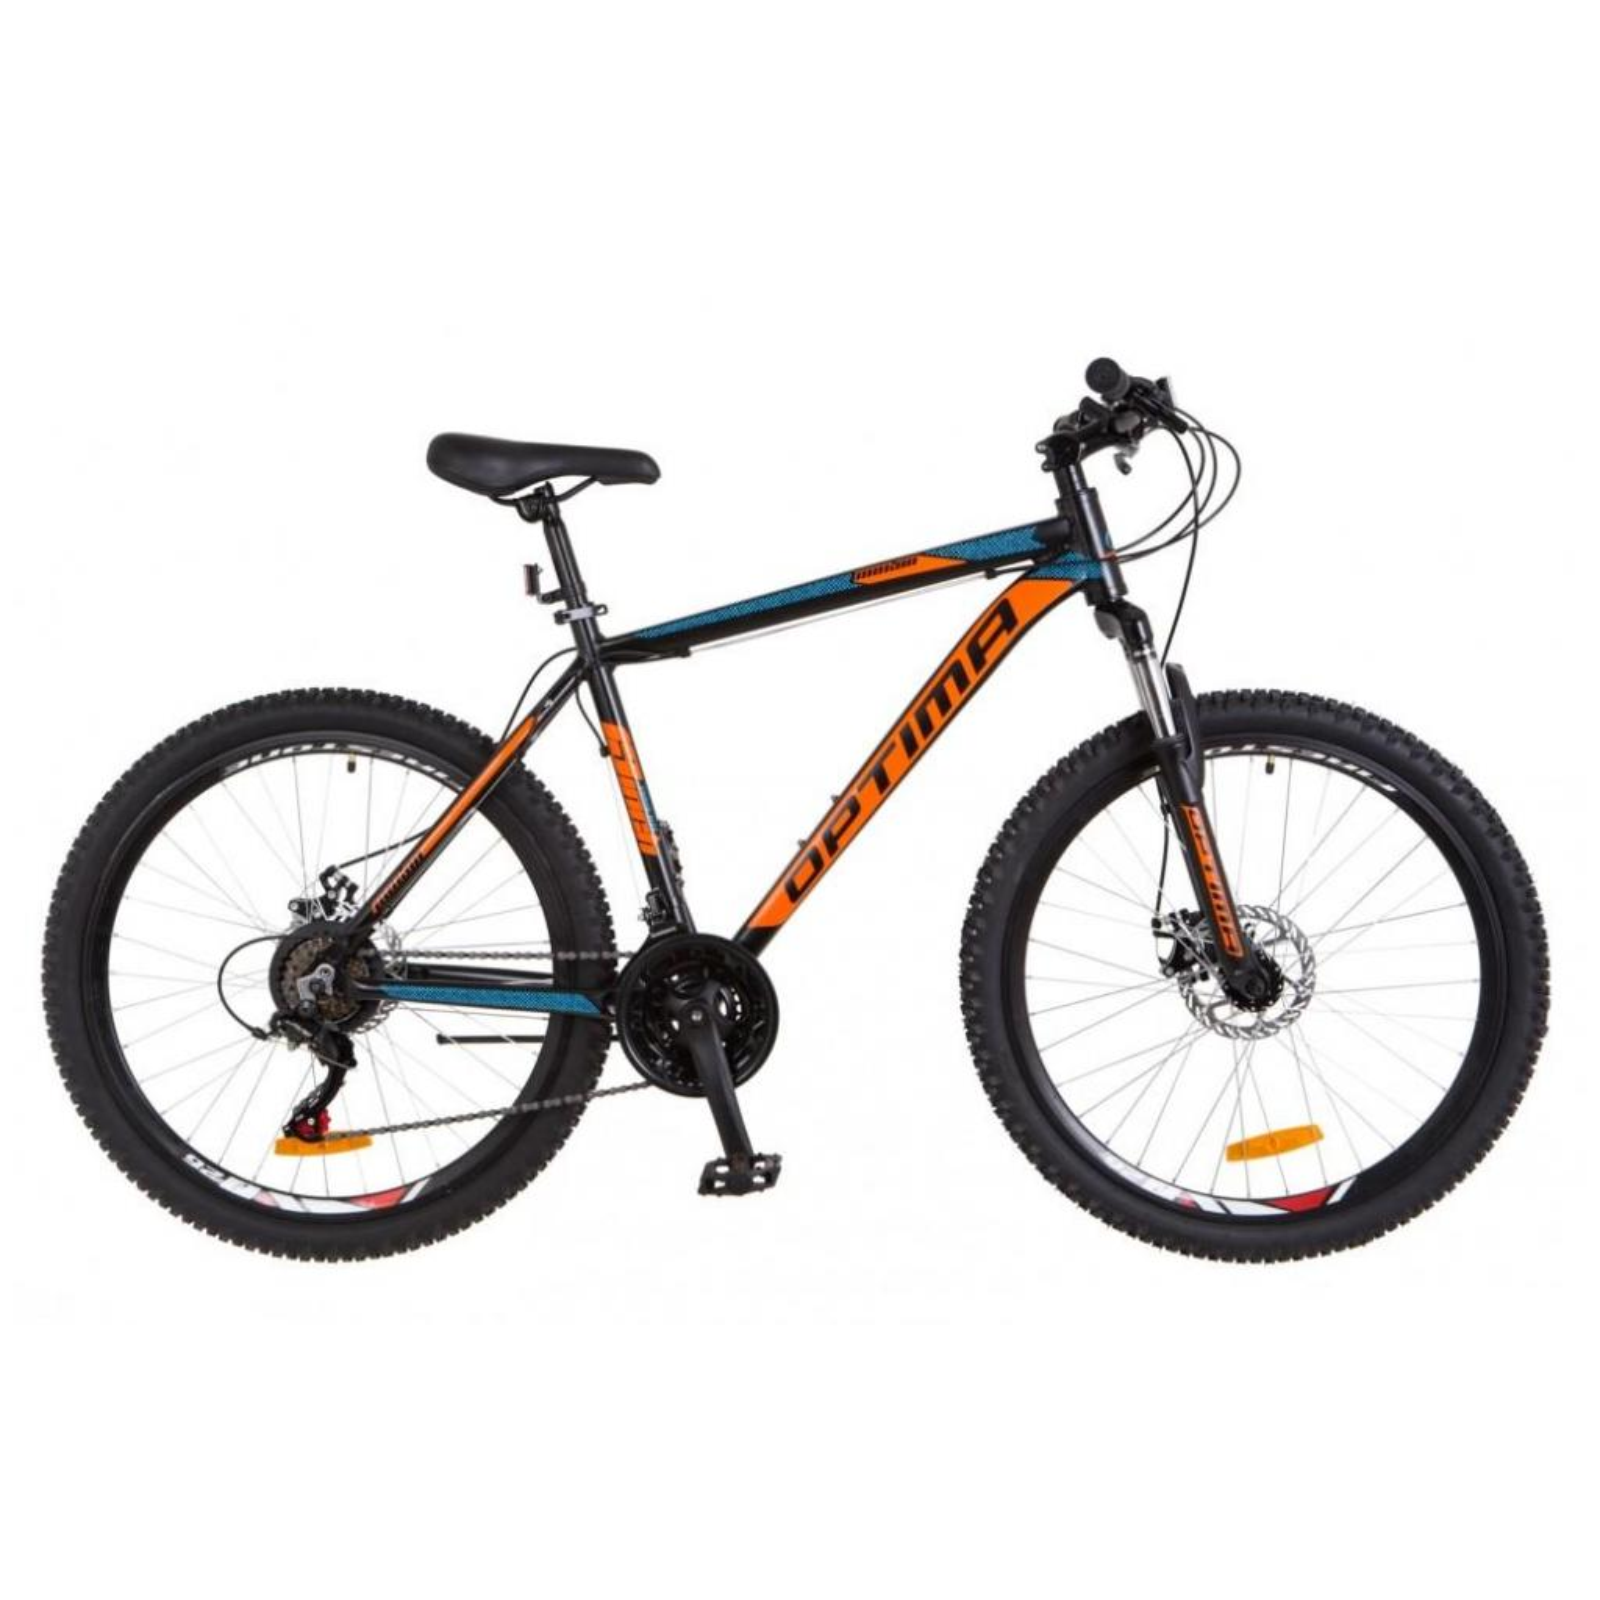 "Велосипед Optimabikes 29"" MOTION 2018 AM 14G DD рама-21"" Al черно-оранжевый (OPS-OP-29-062)"